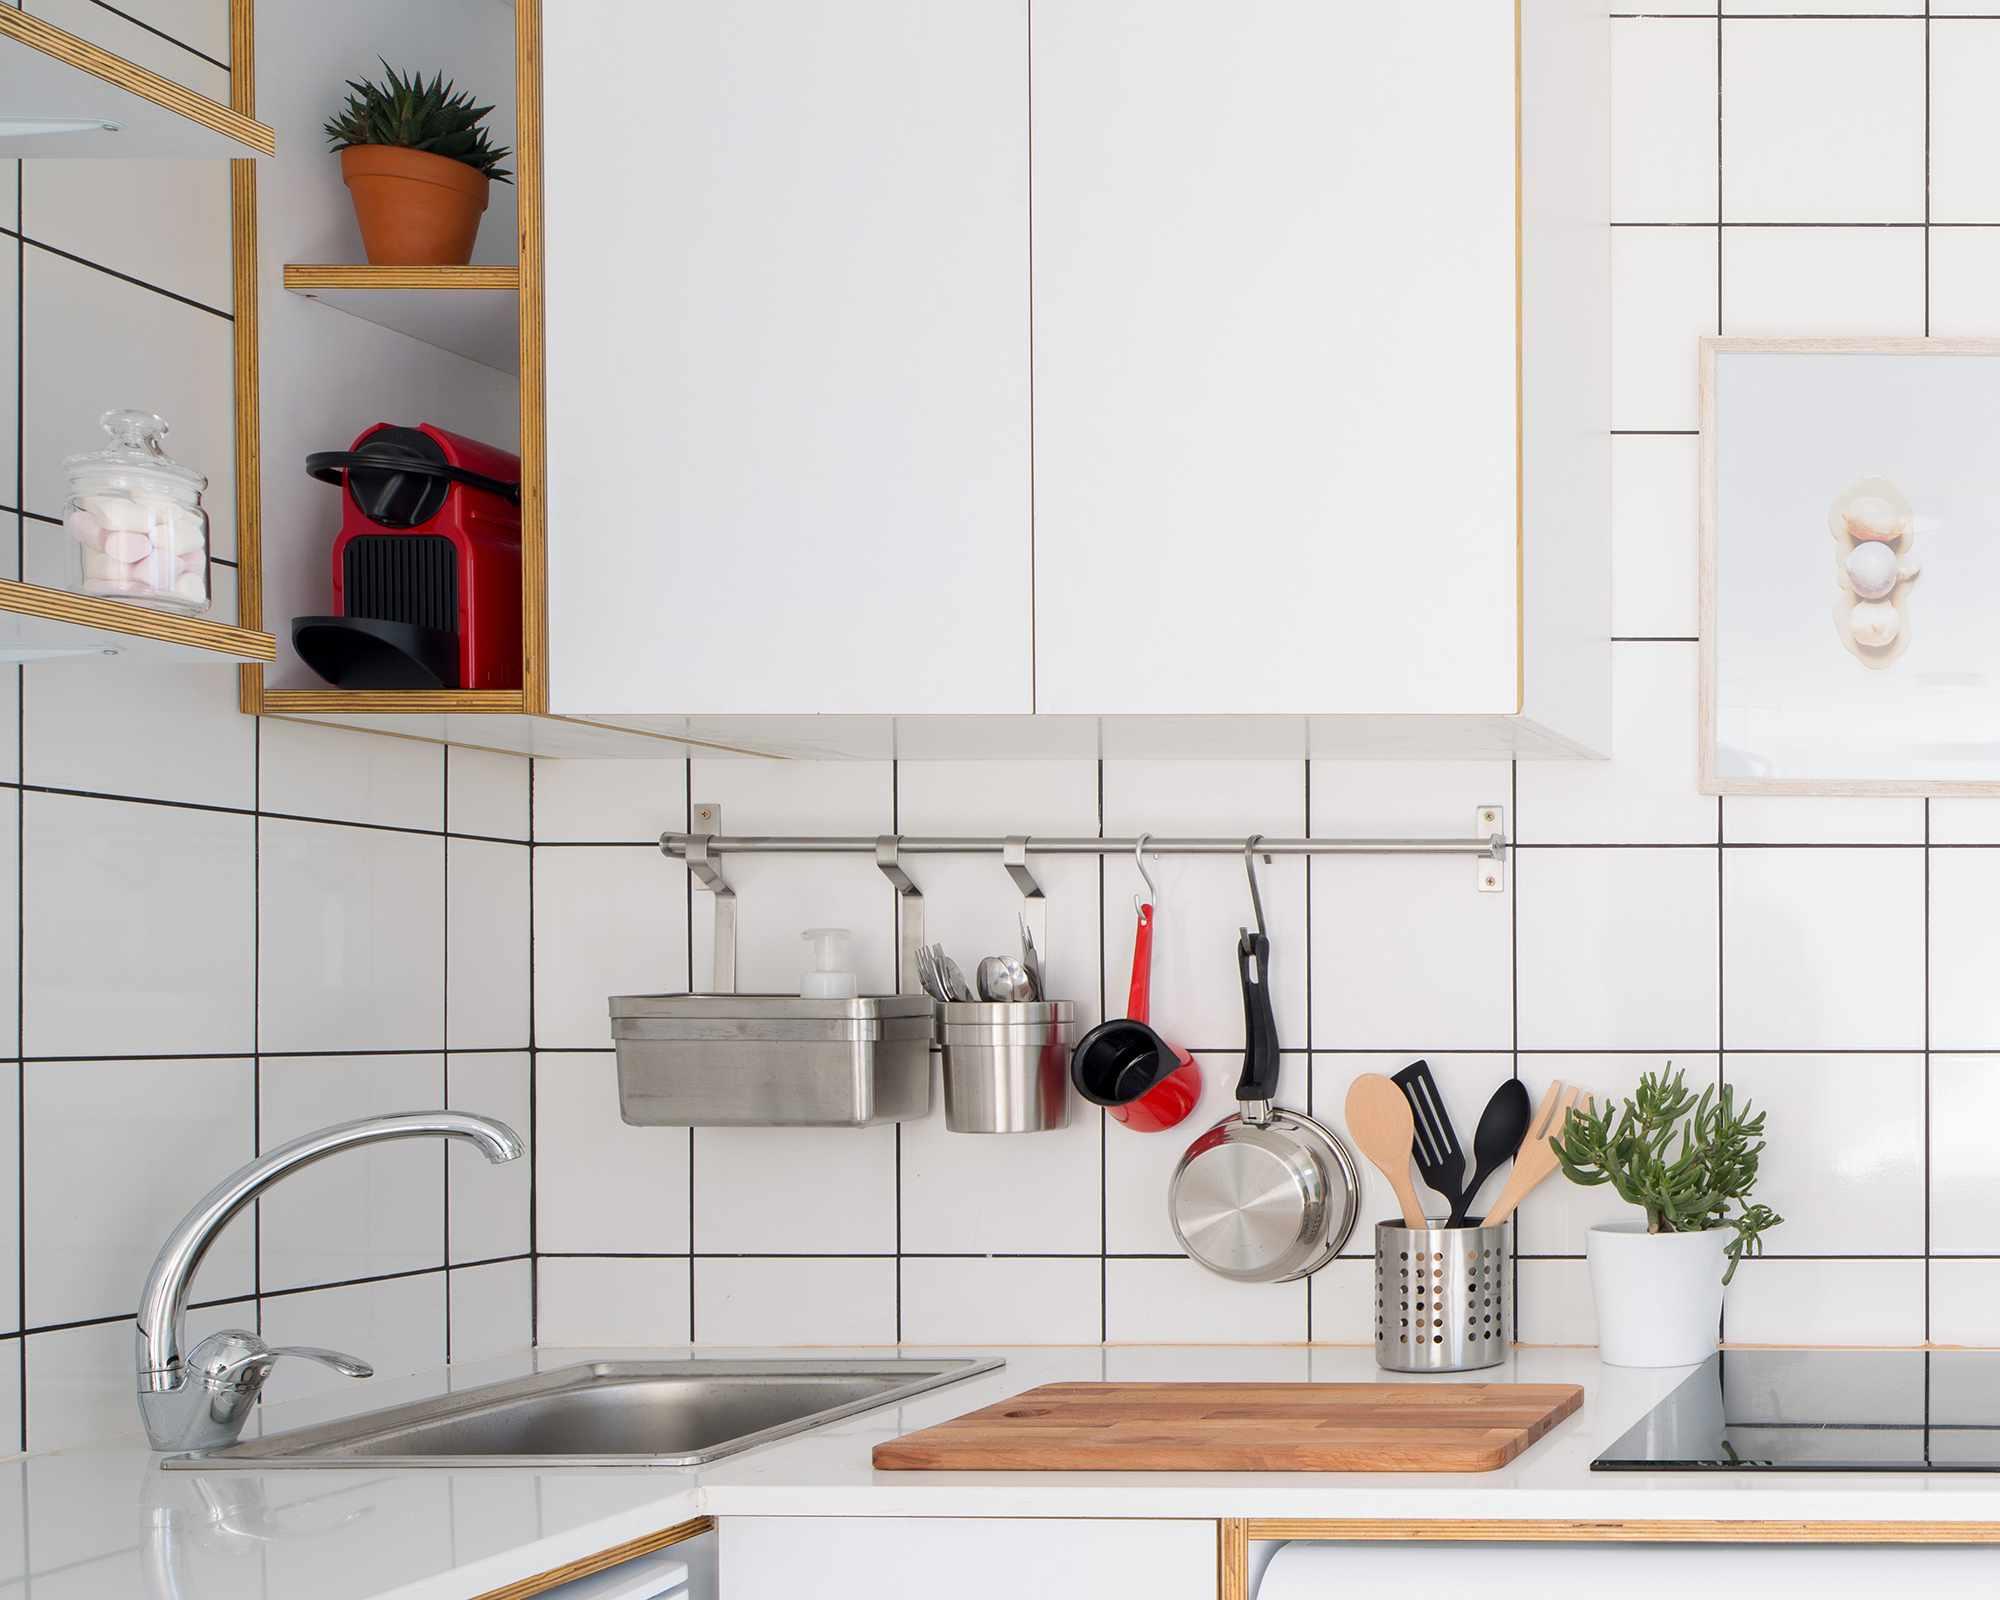 The Shoebox micro-apartment by Elie Metni kitchen